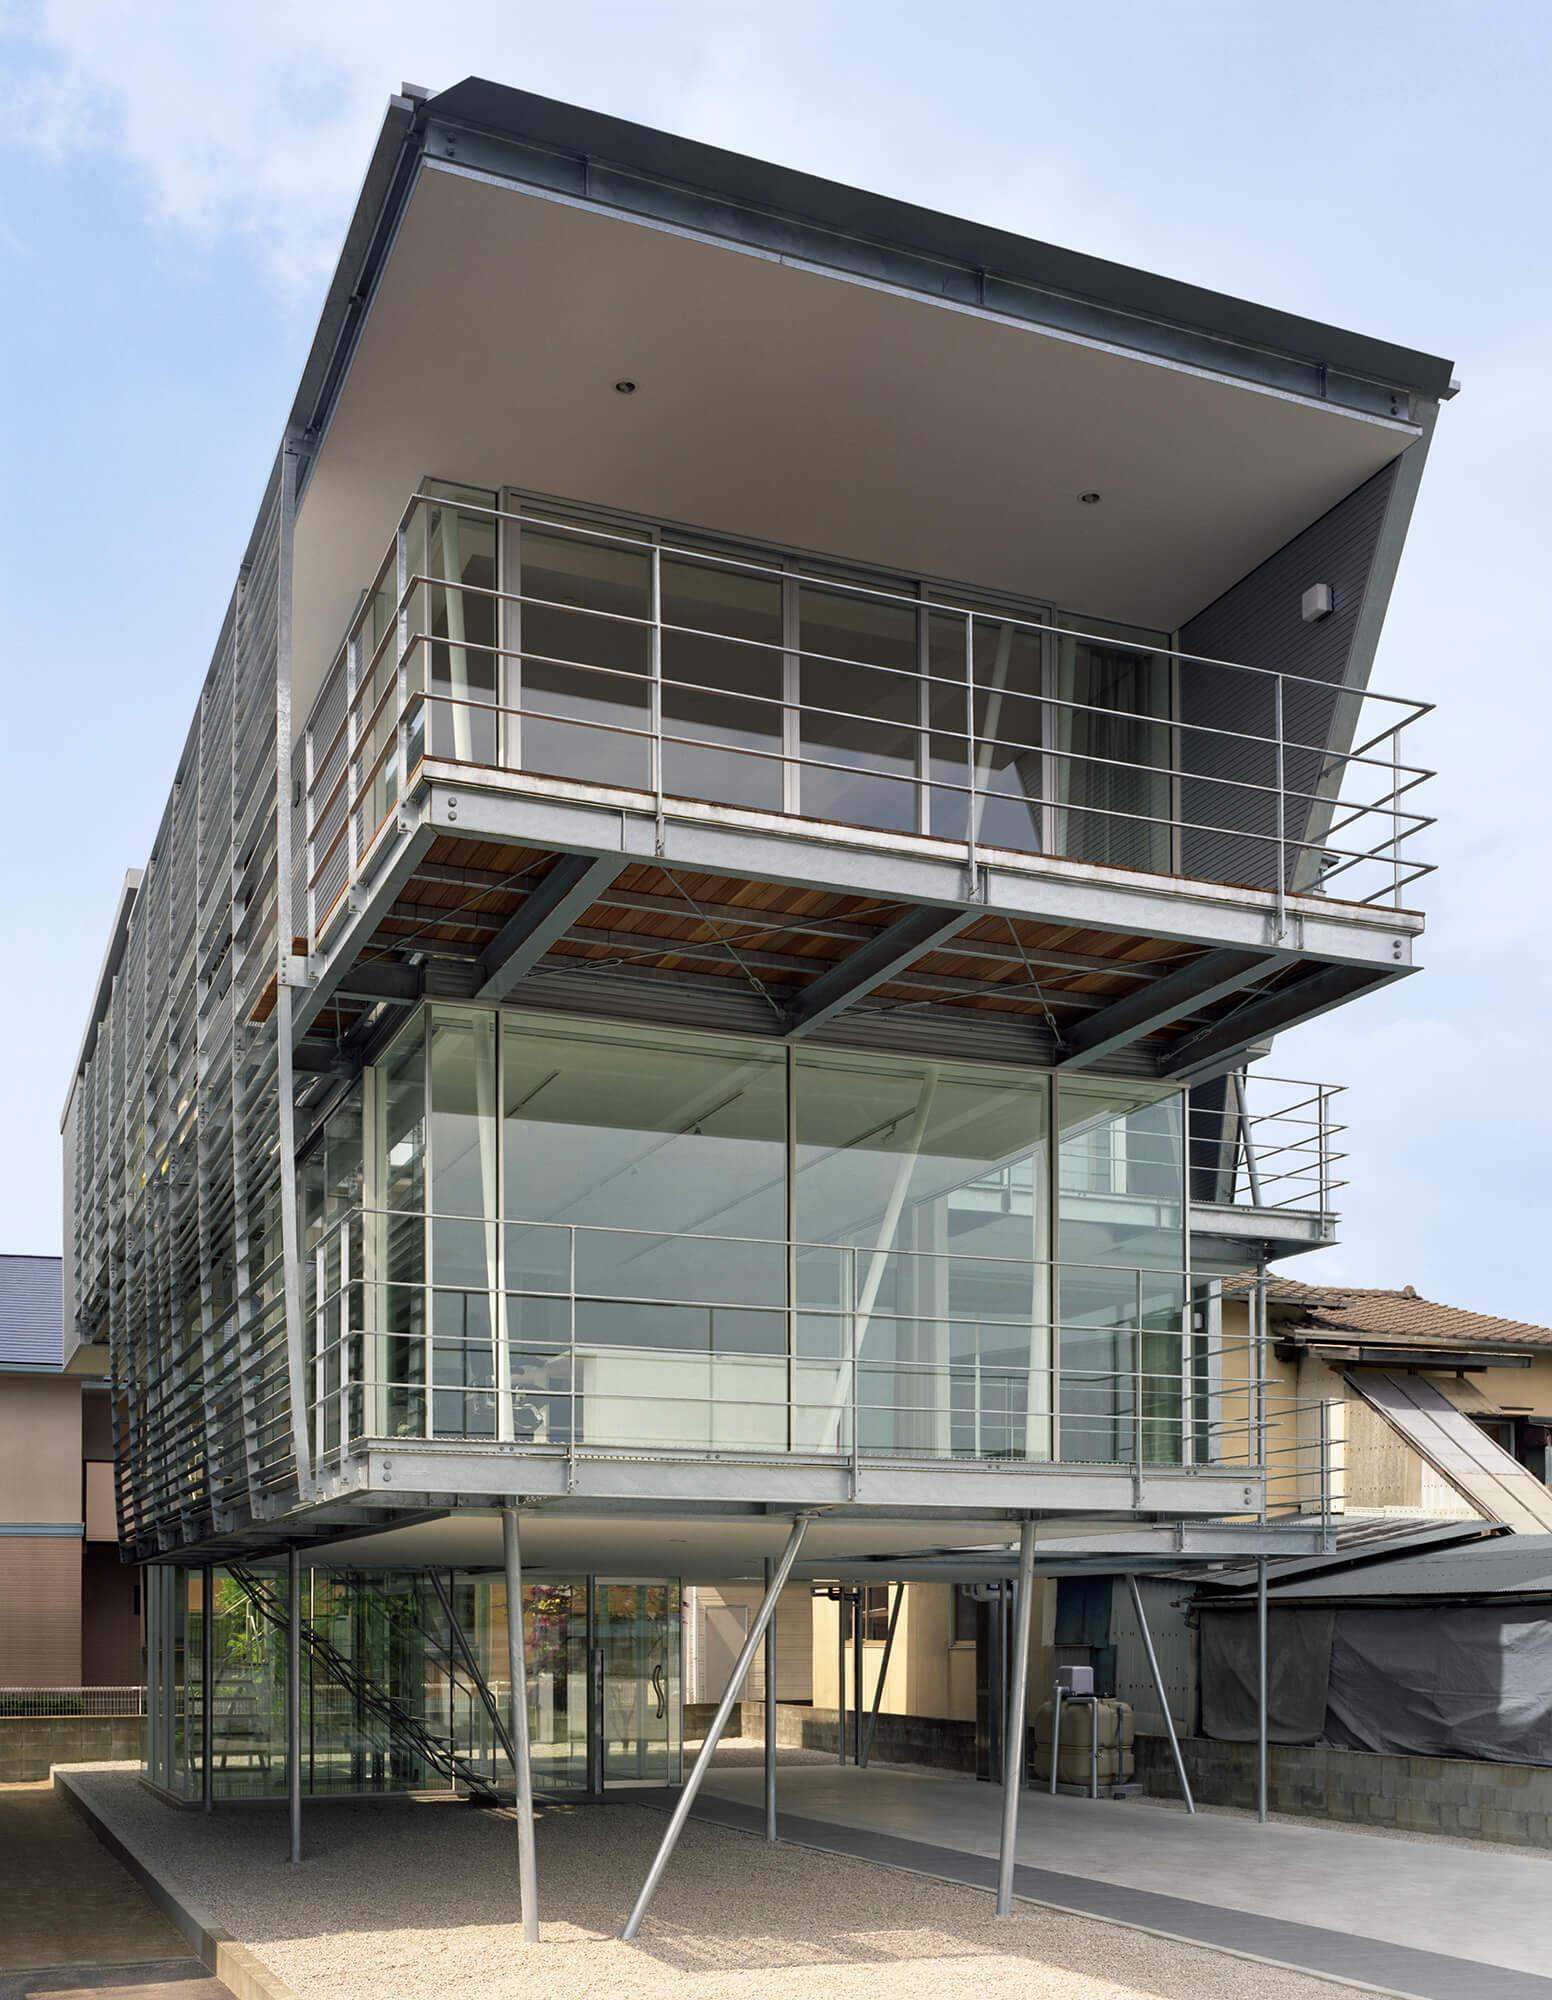 『筒井の家』-福岡県大野城市-建築写真・竣工写真・インテリア写真2